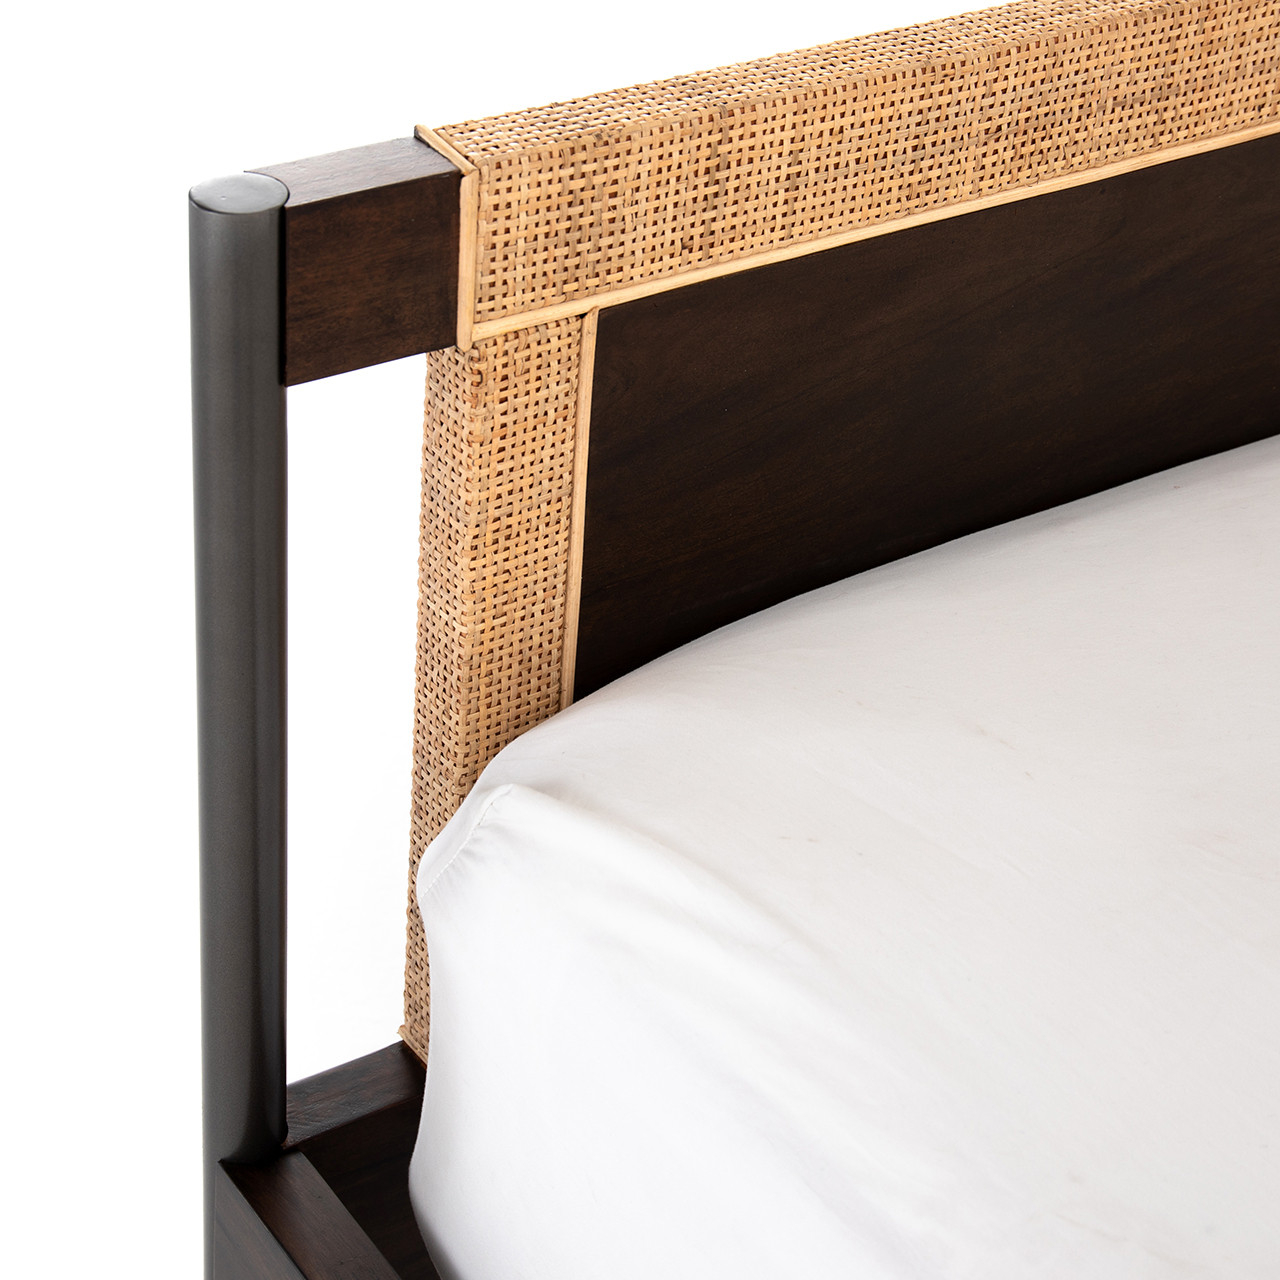 Jordan Bed-Natural Cane - Queen